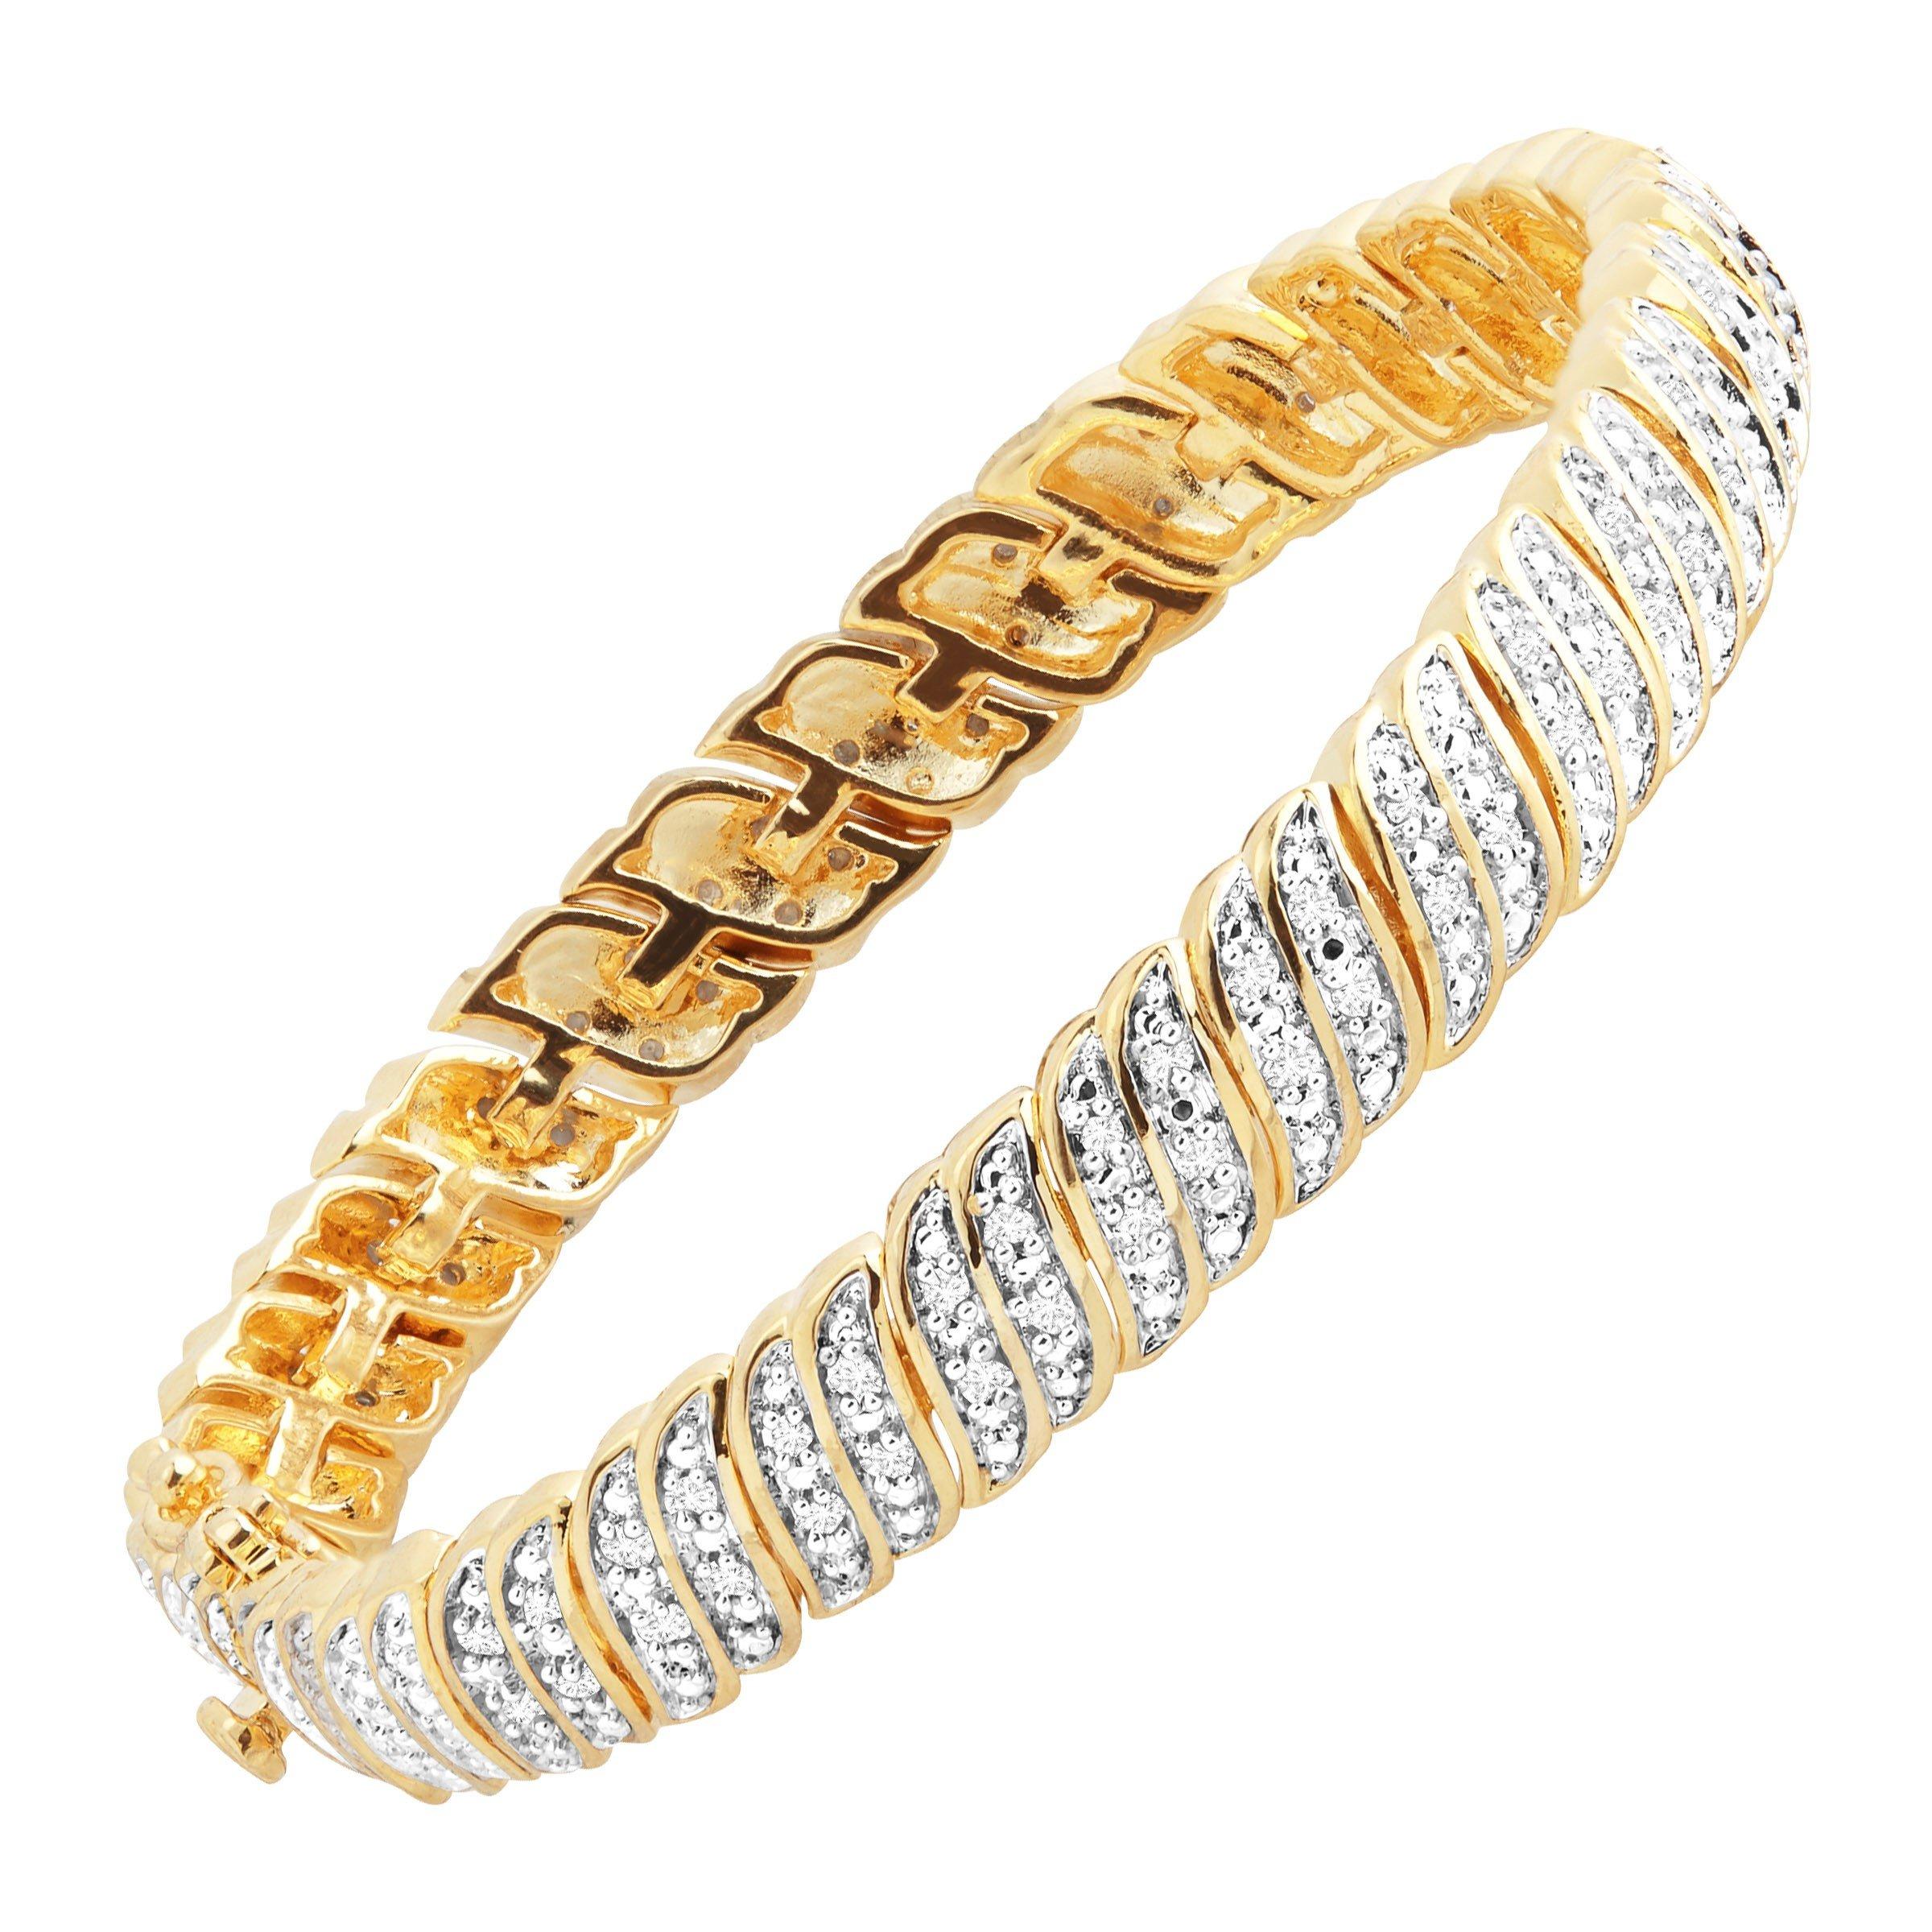 1 ct Diamond 'S' Link Tennis Bracelet in 18K Gold-Plated Brass, 7.25'' by Finecraft